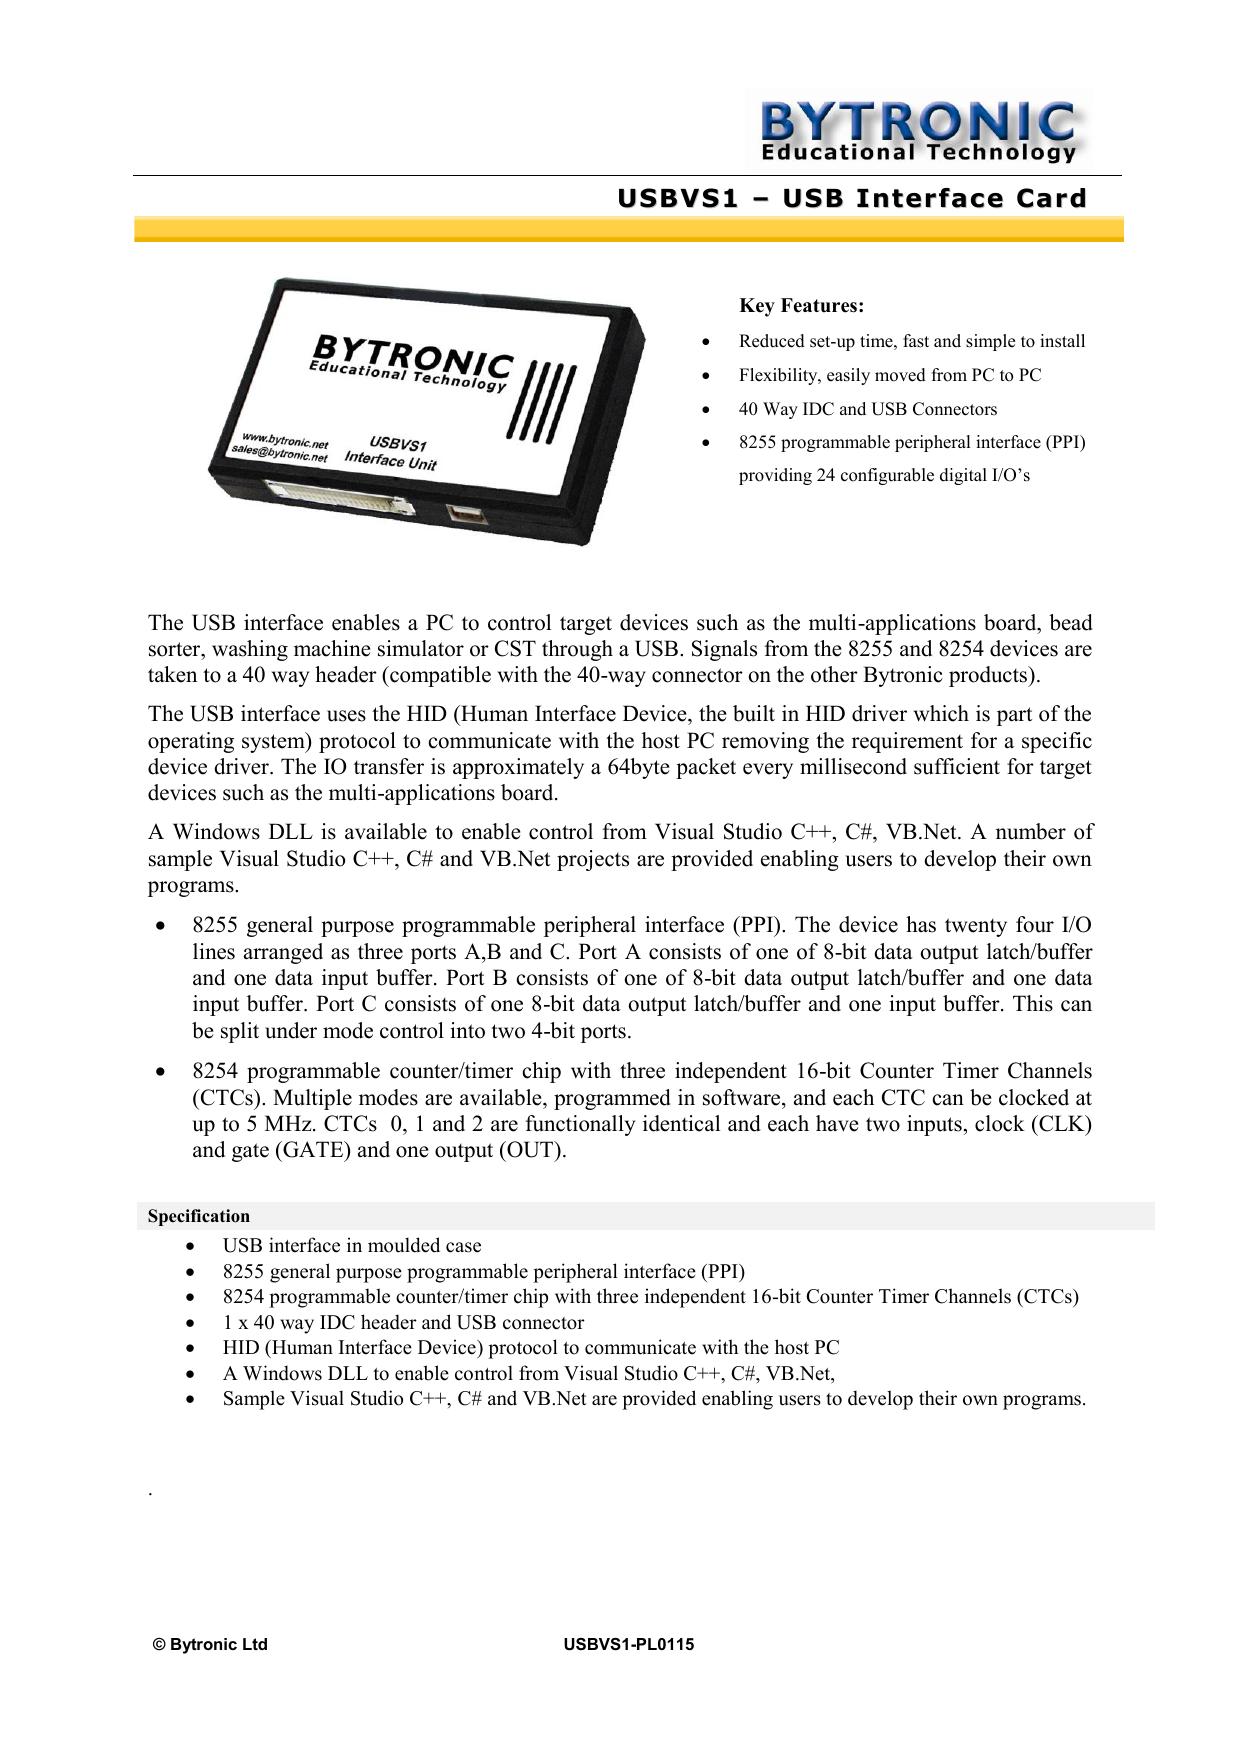 USBVS1 – USB Interface Card   manualzz com